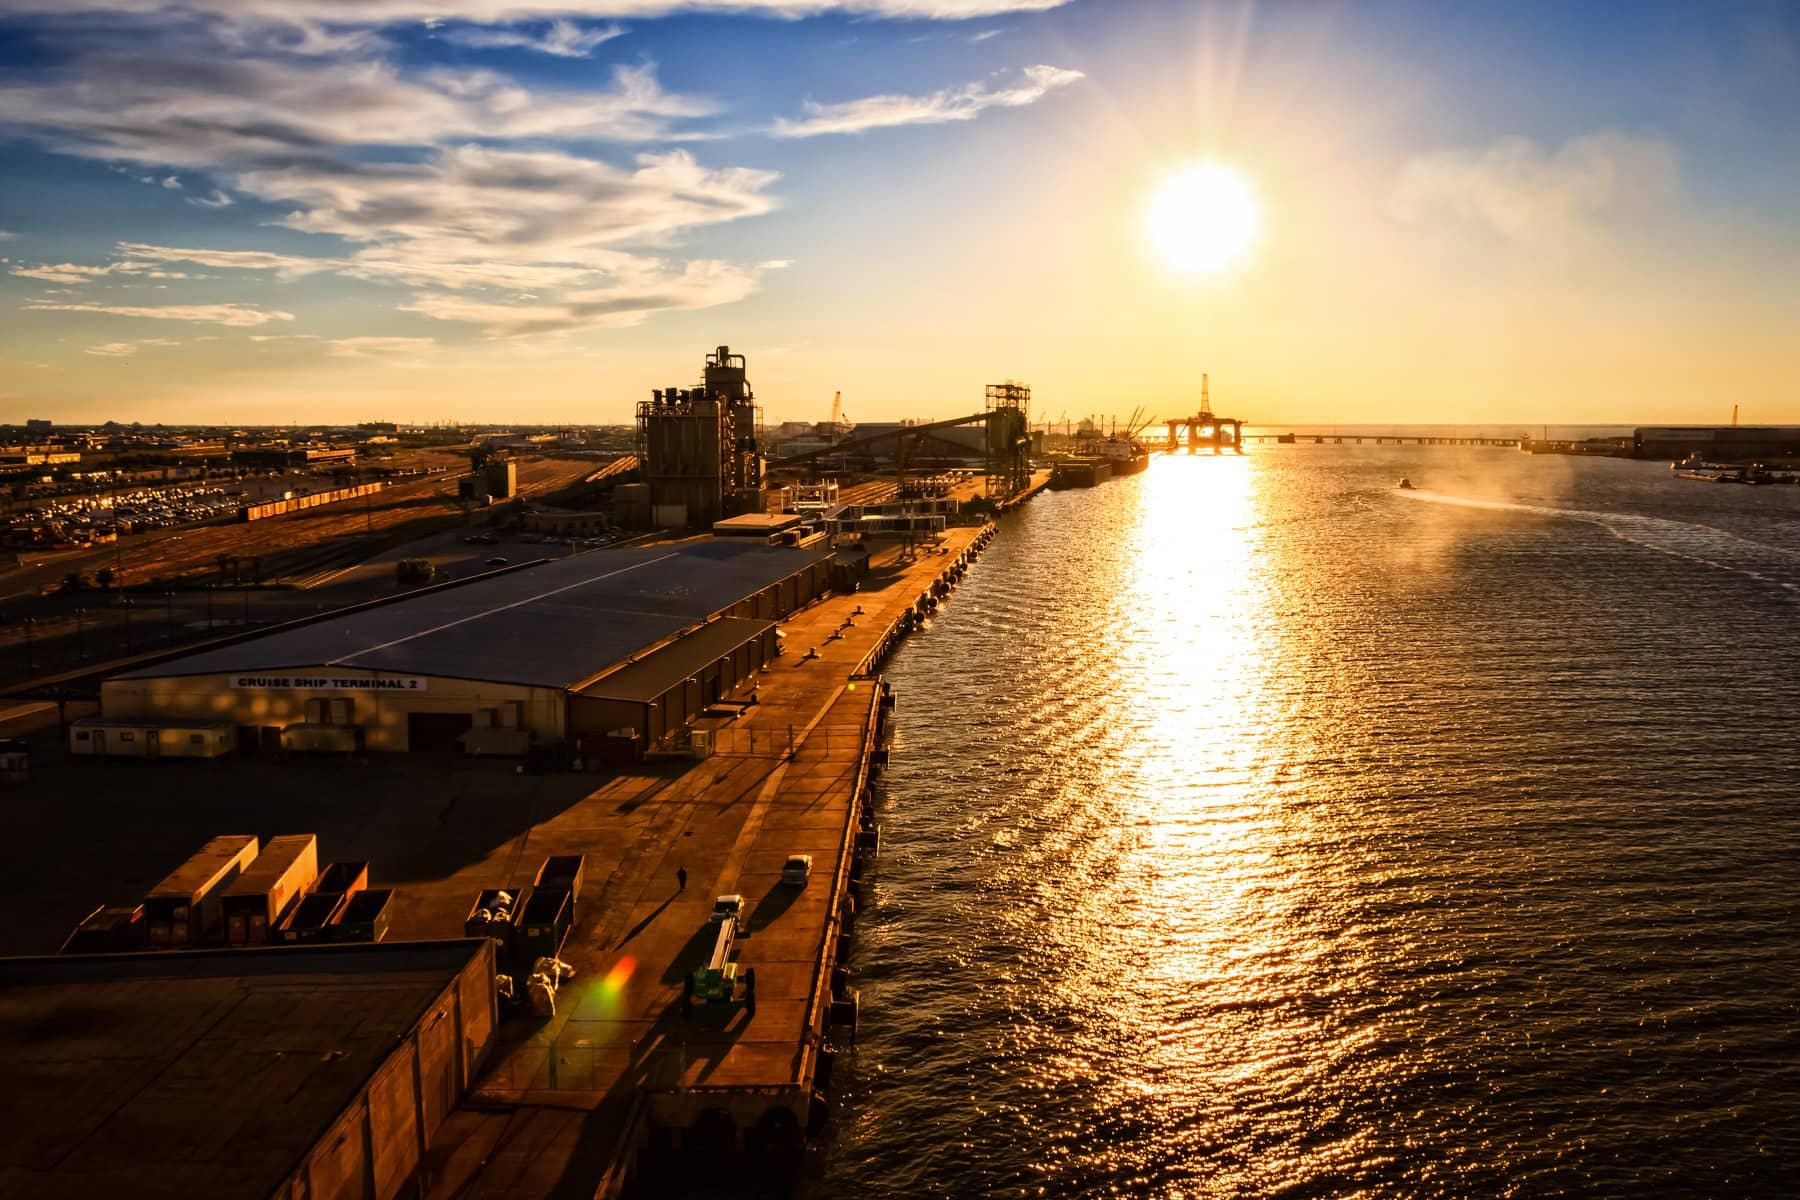 The Port of Galveston is illuminated by the sun setting along the Texas Coast.